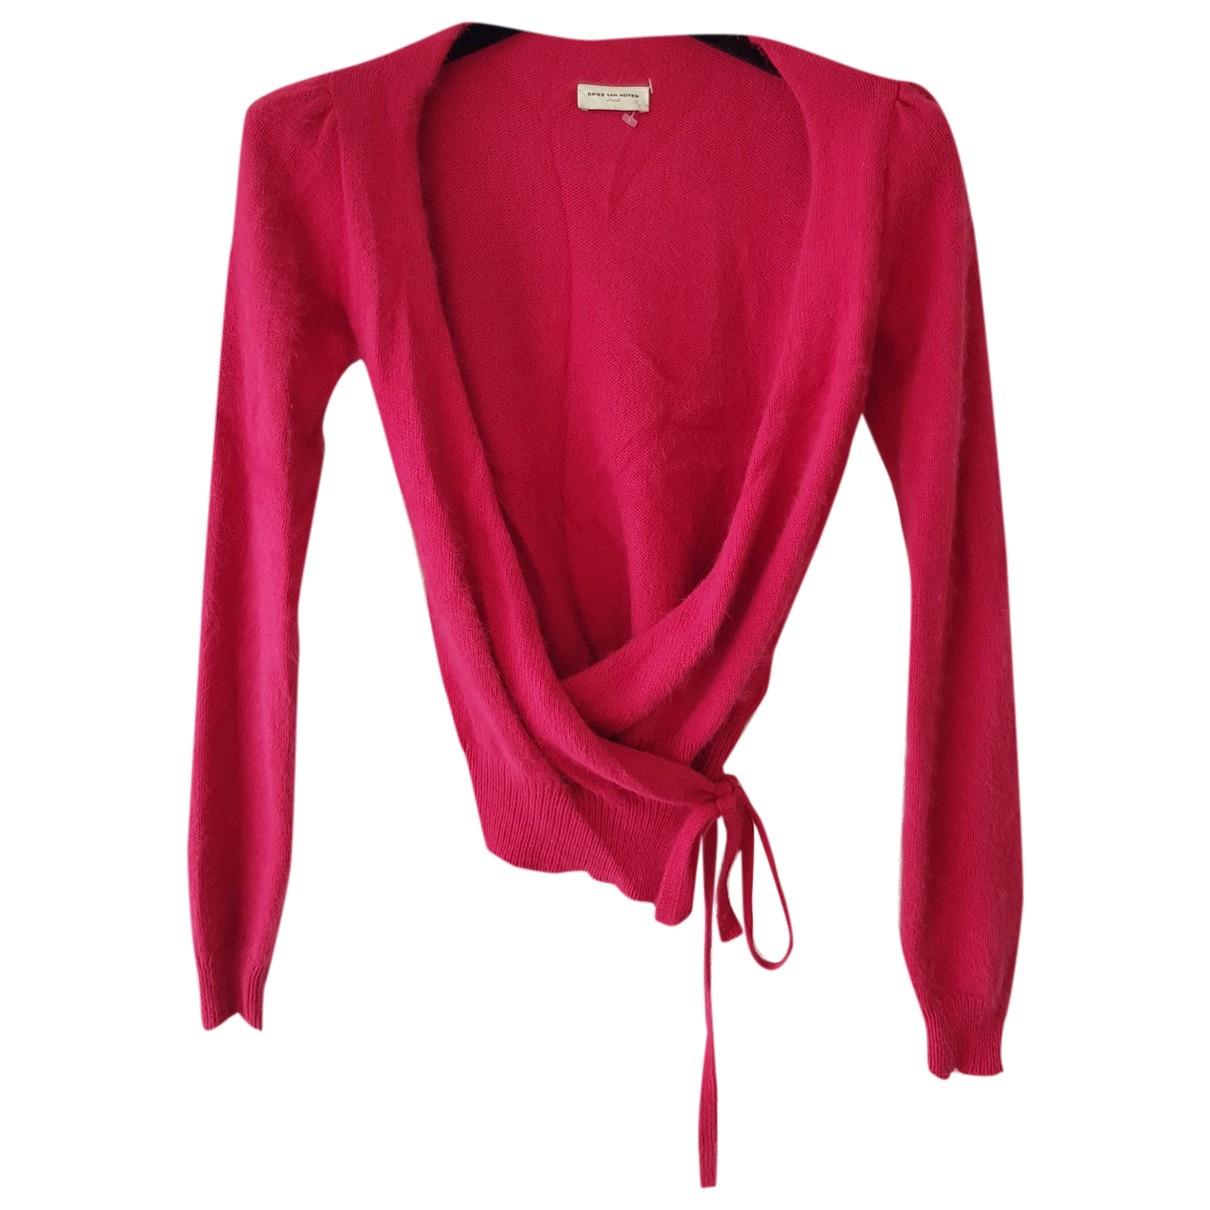 Dries Van Noten \N Pink Cashmere Knitwear for Women S International